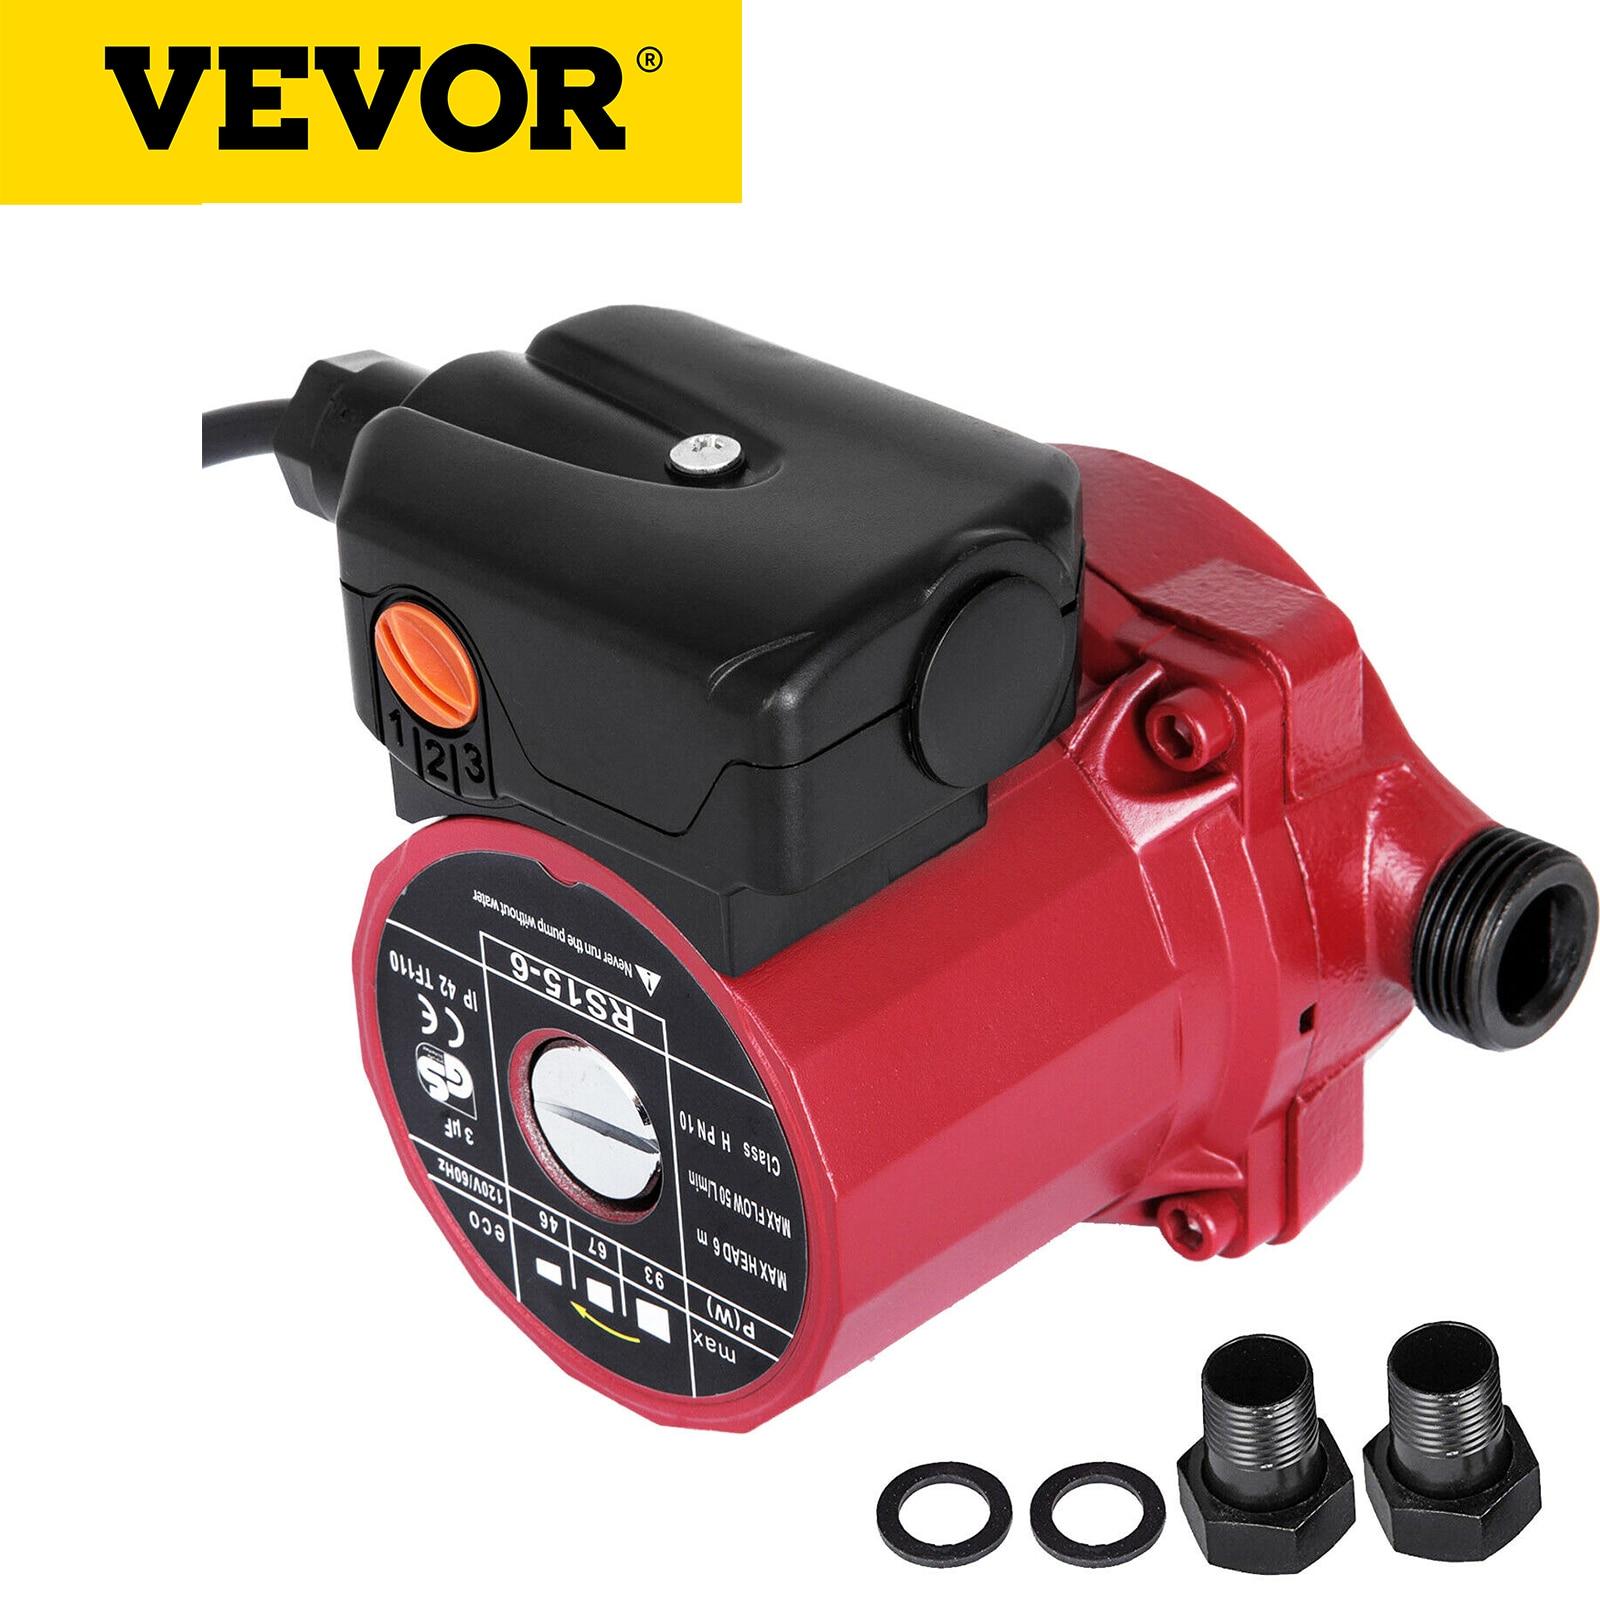 VEVOR RS15-6 مضخة إعادة تدوير الماء الساخن 110 فولت مضخة توزيع 3/4 بوصة NPT 3-speed 9.5 Gpm سخان مياه إعادة مضخة توزيع